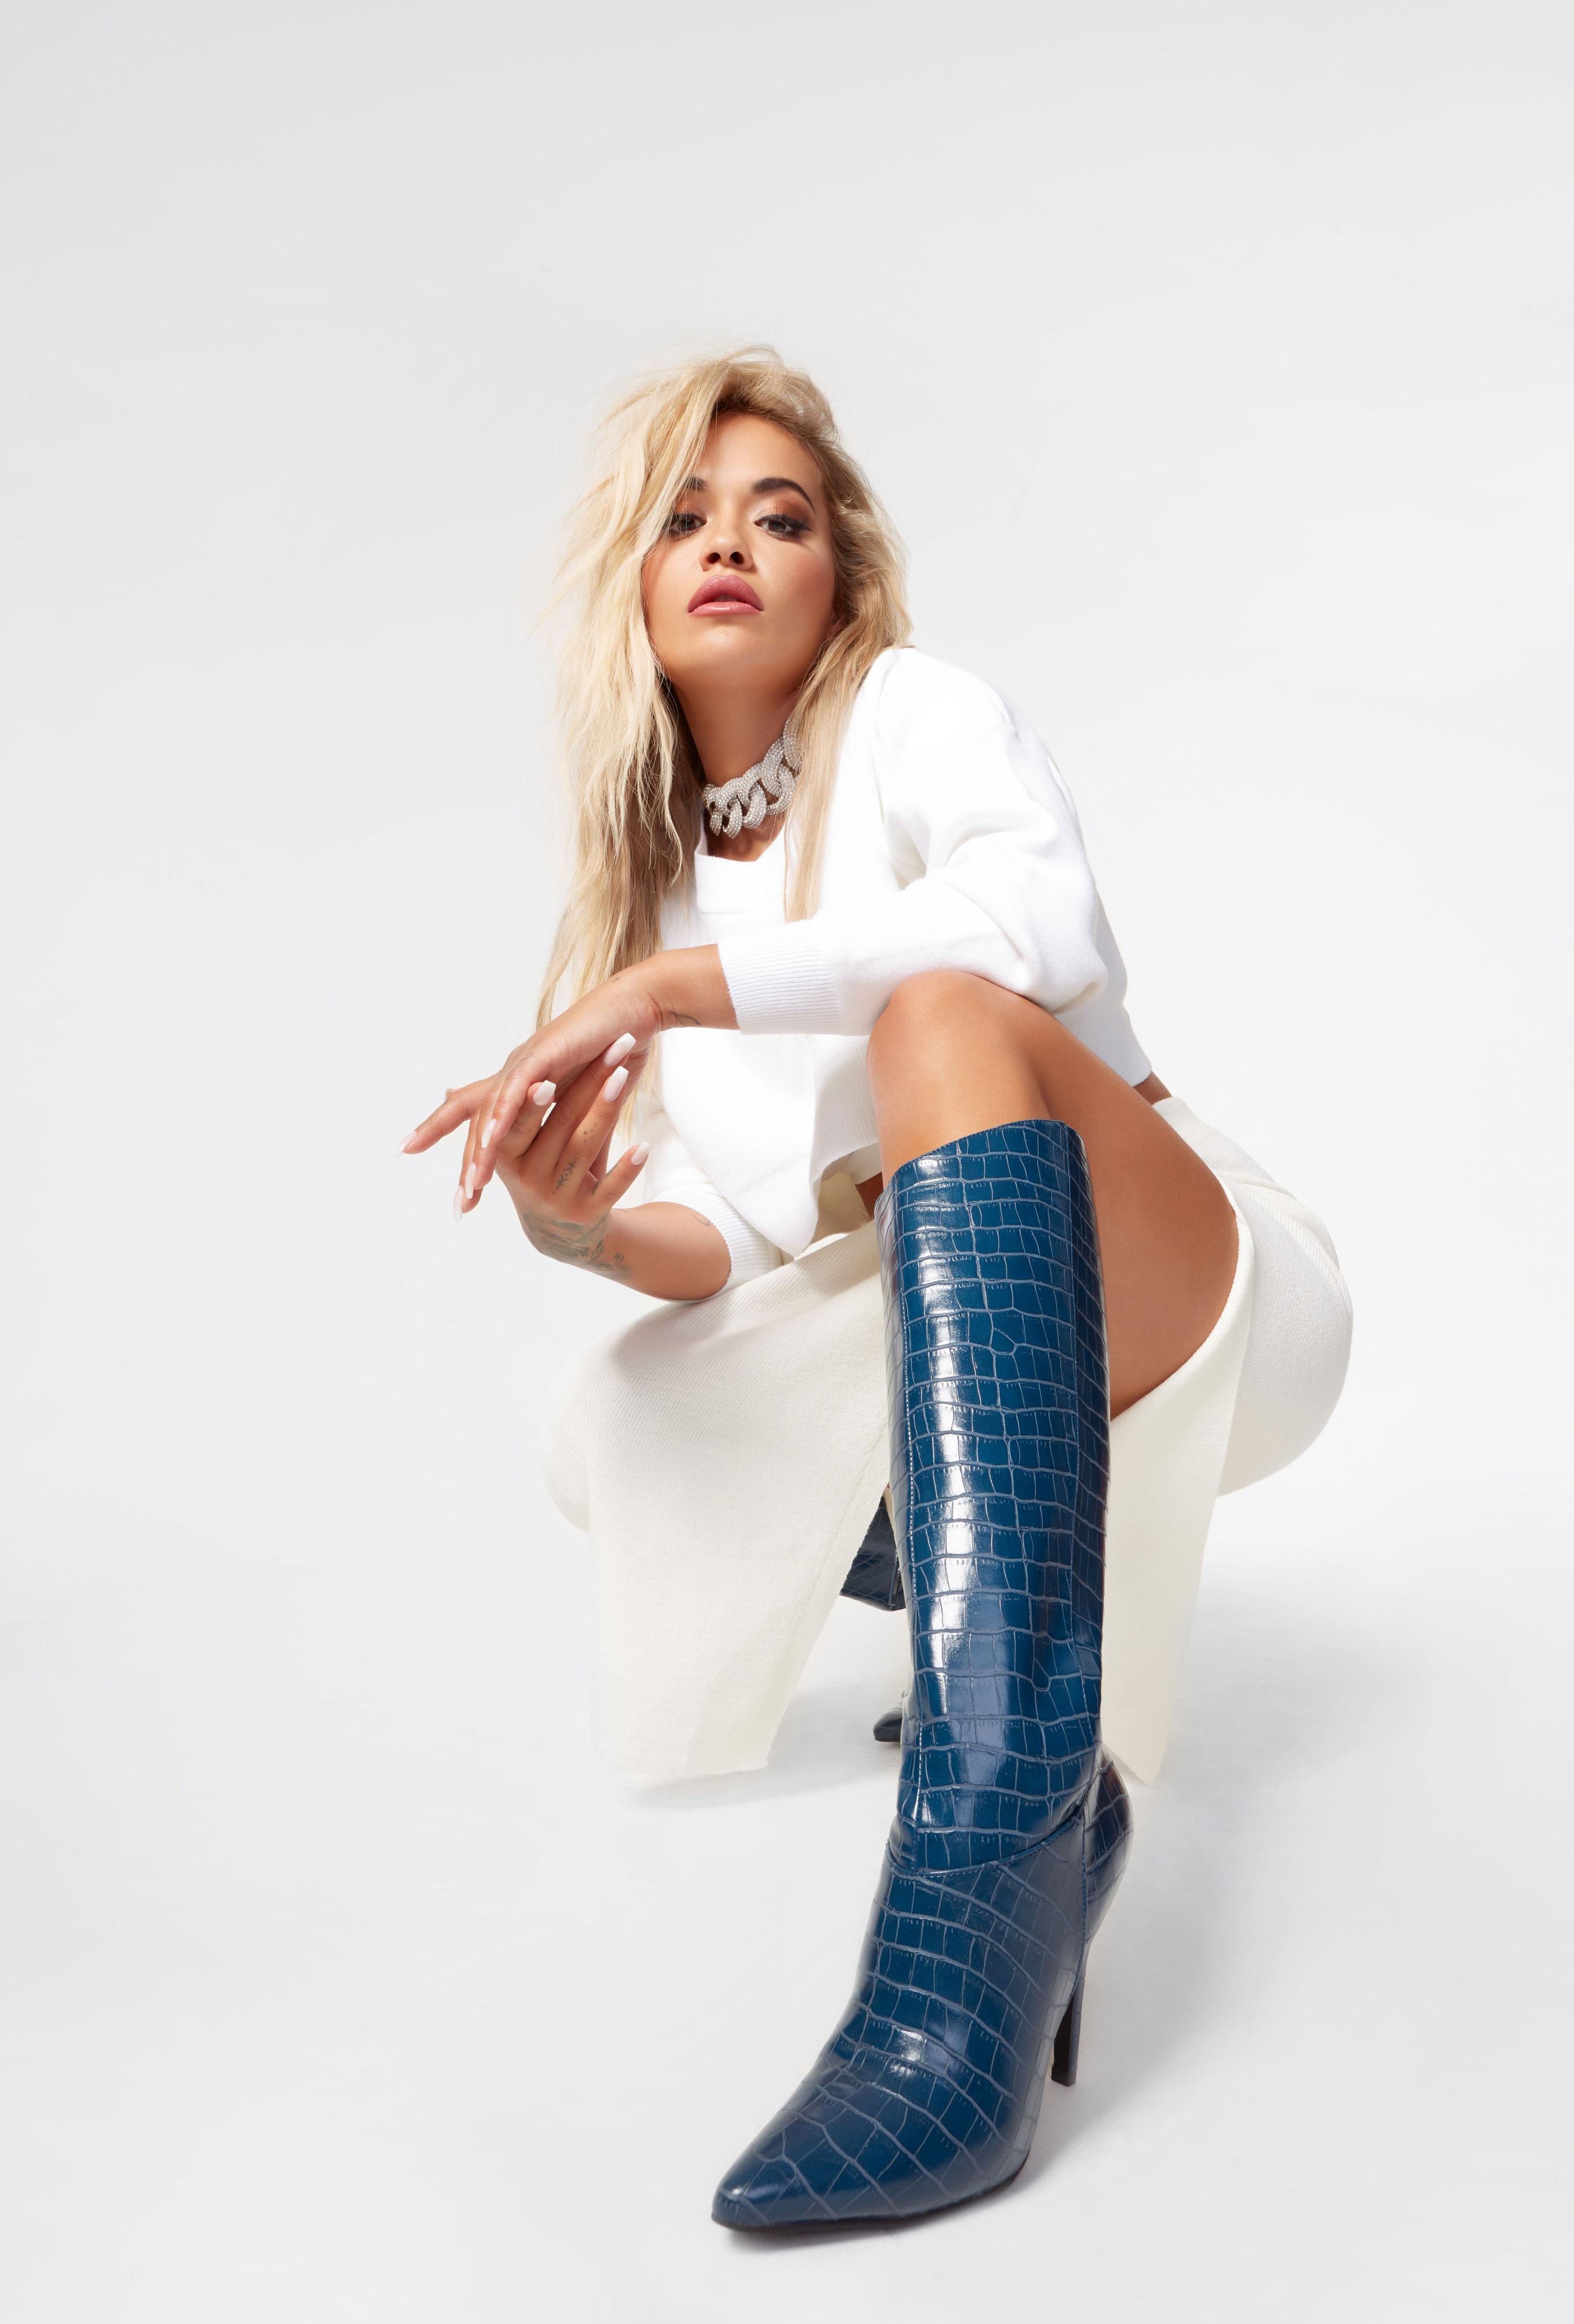 Рита Ора в обуви модного бренда ShoeDazzle, сезон 2020 / фото 25